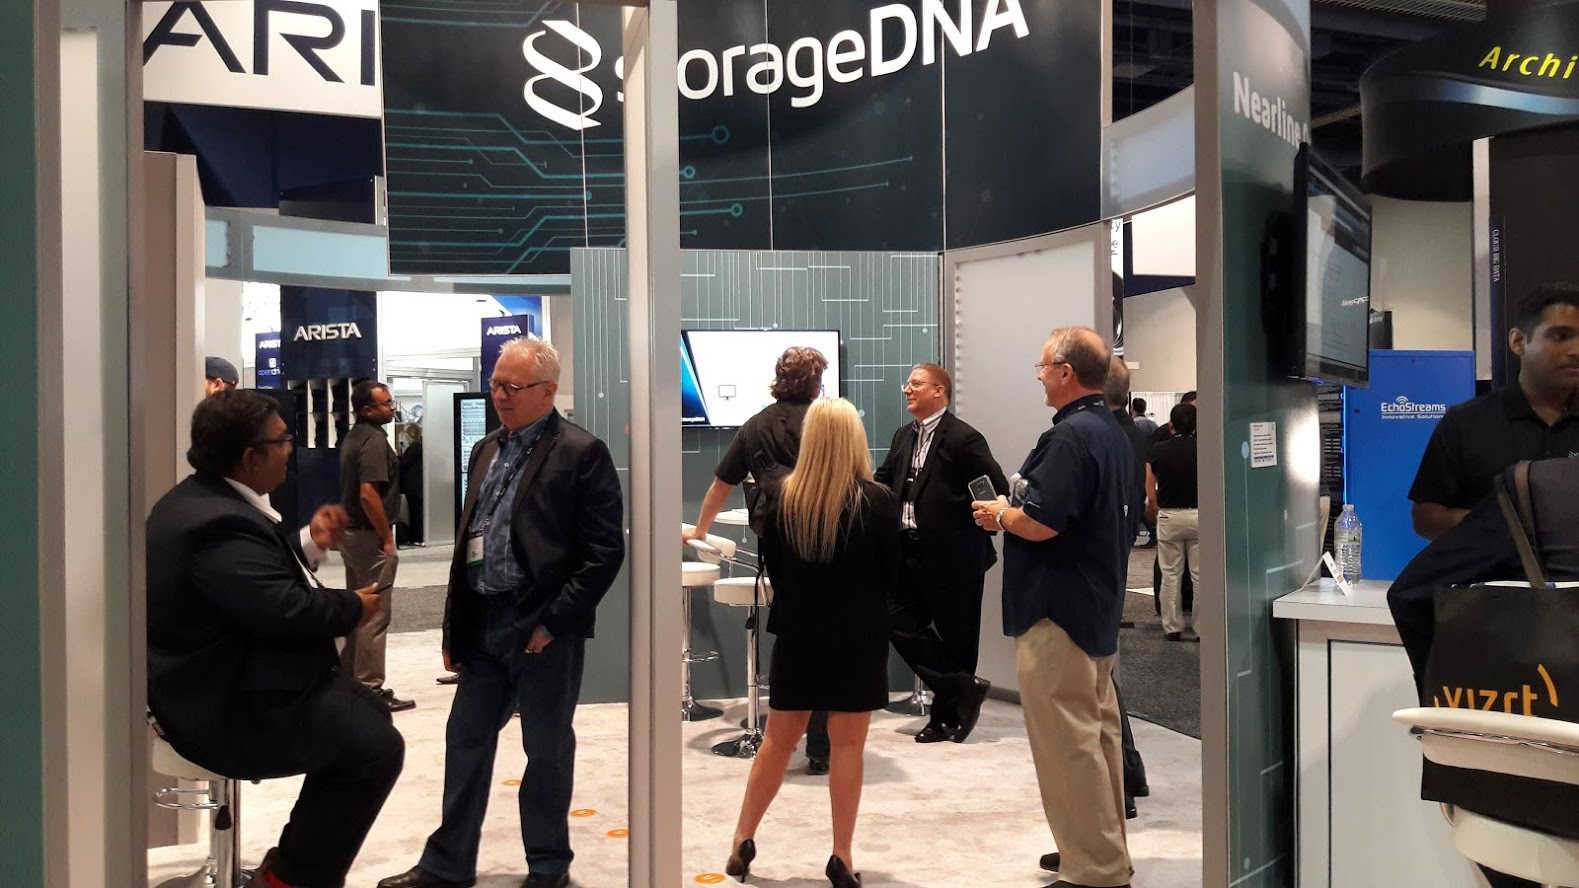 StorageDNA_NAB 2017_Stand Image_1